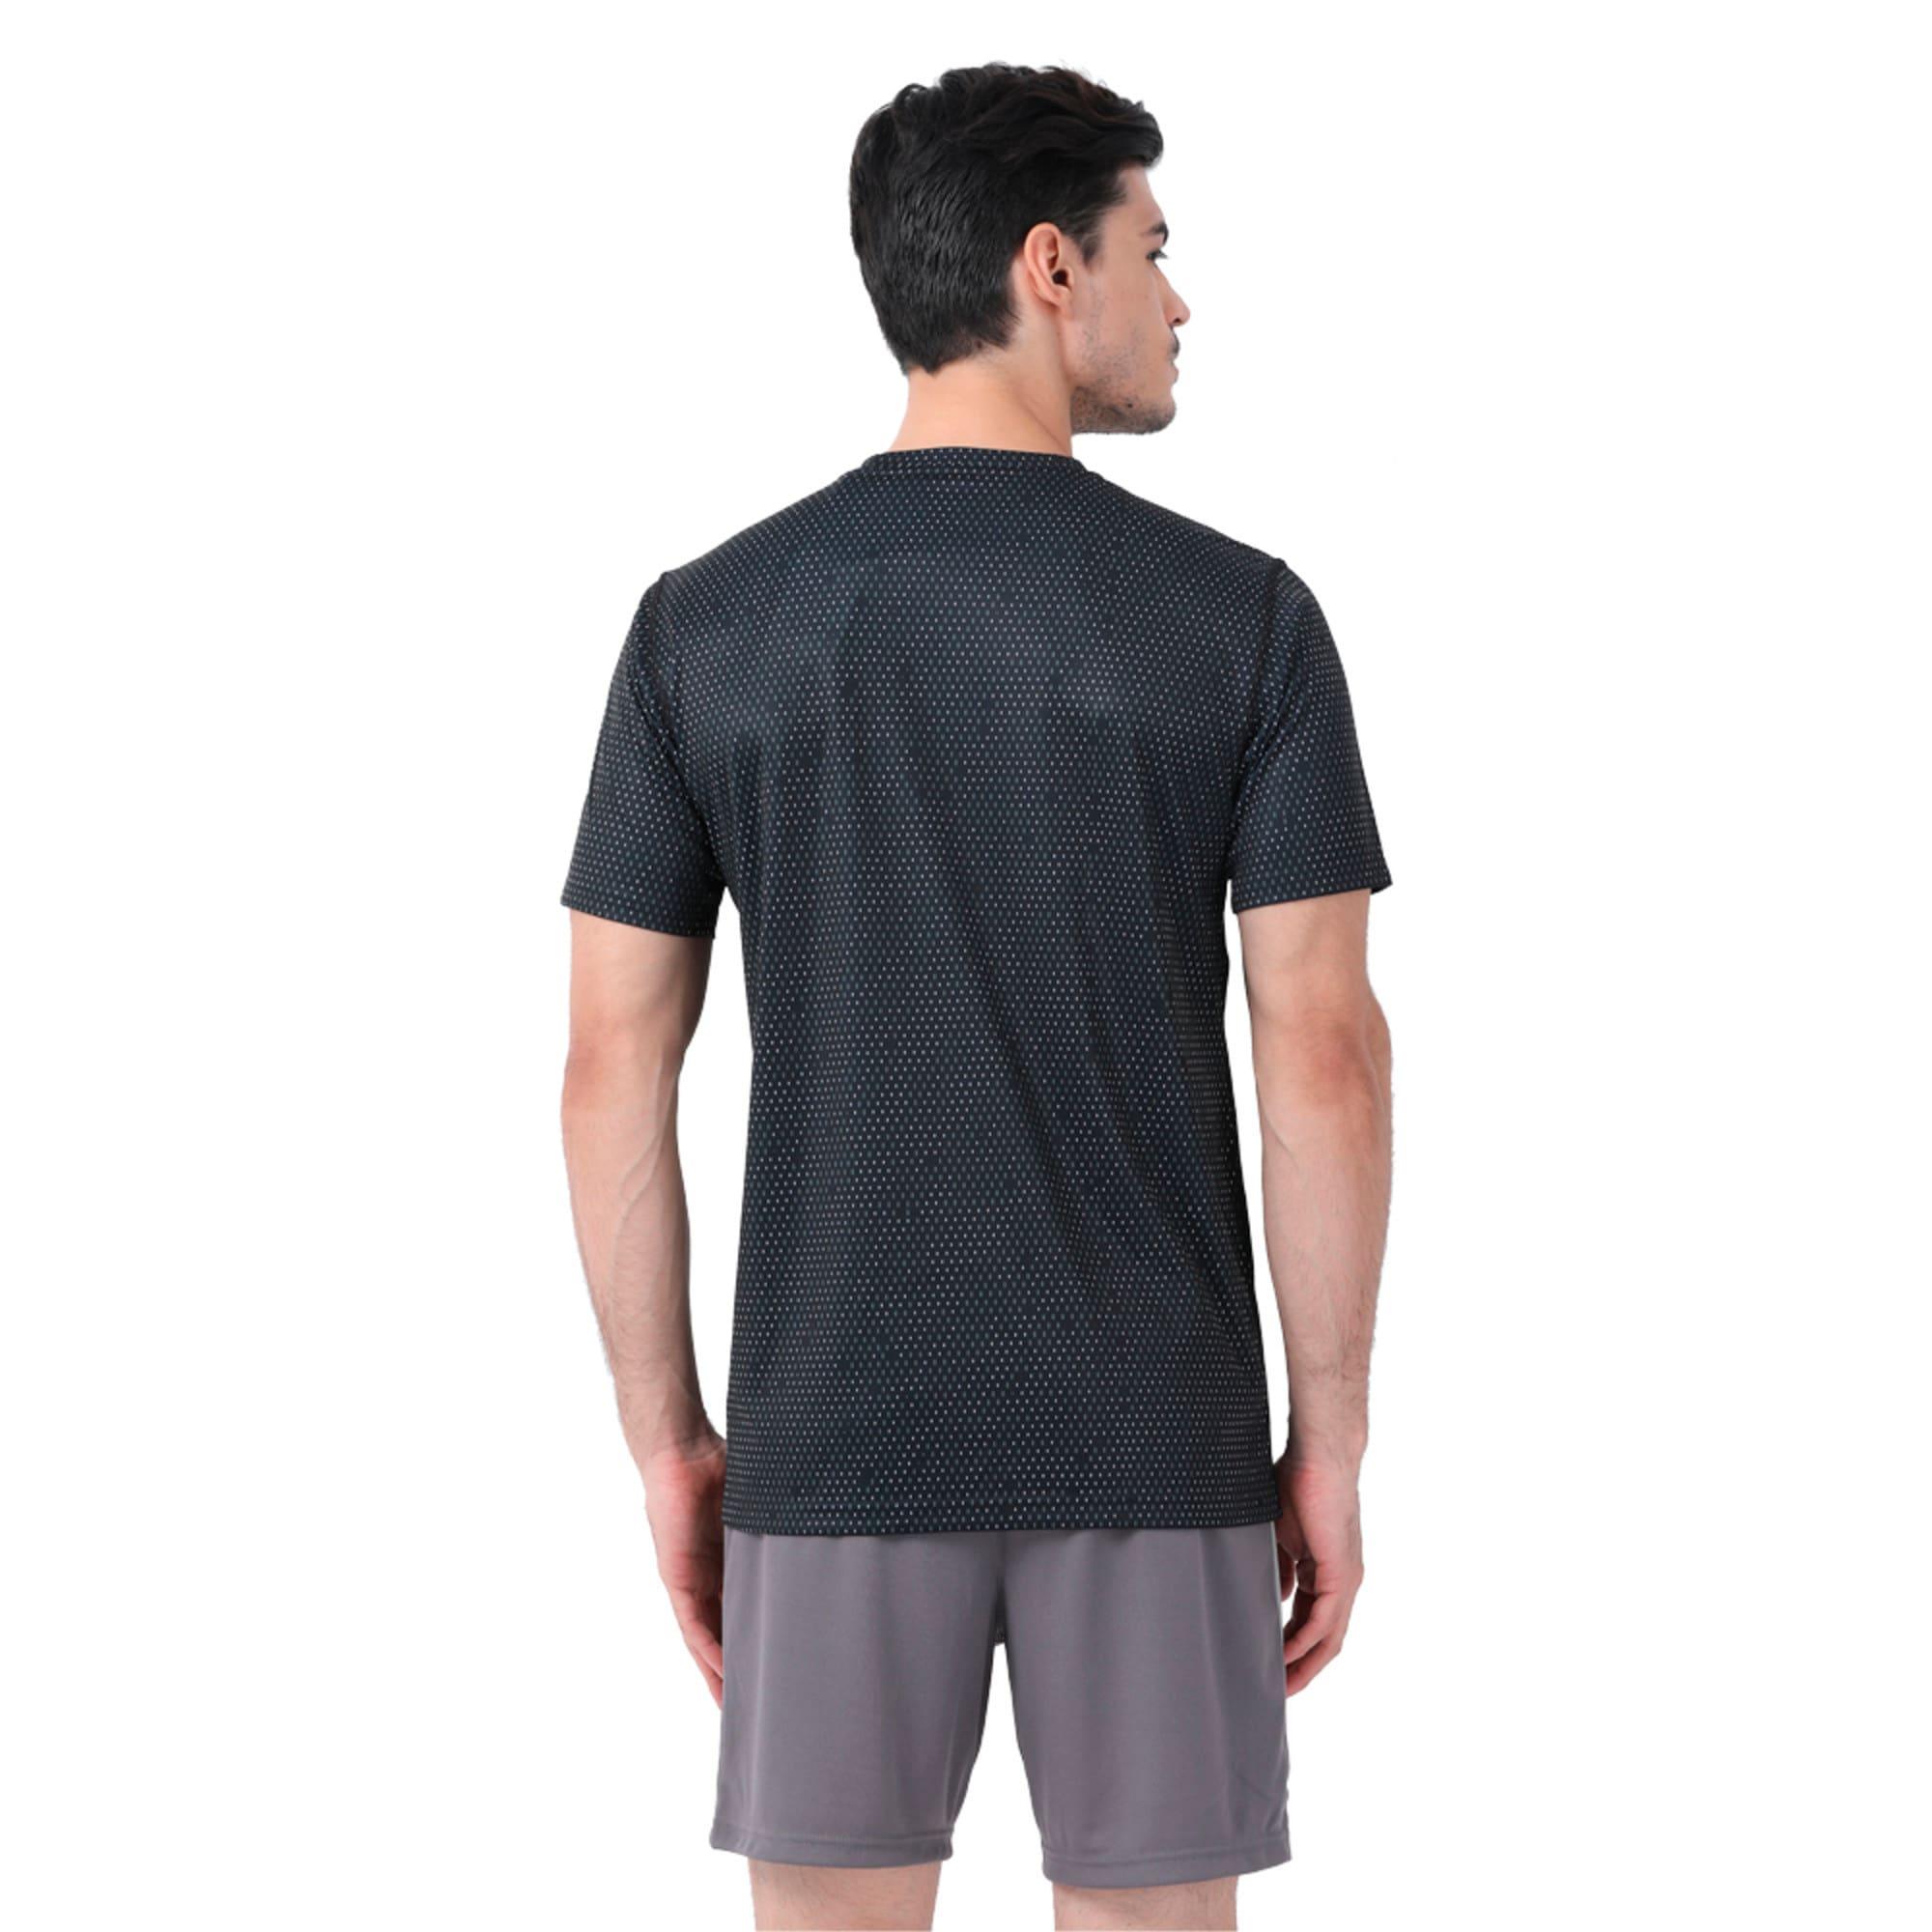 Thumbnail 2 of Training Men's Tech Graphic T-Shirt, puma black-Q3, medium-IND